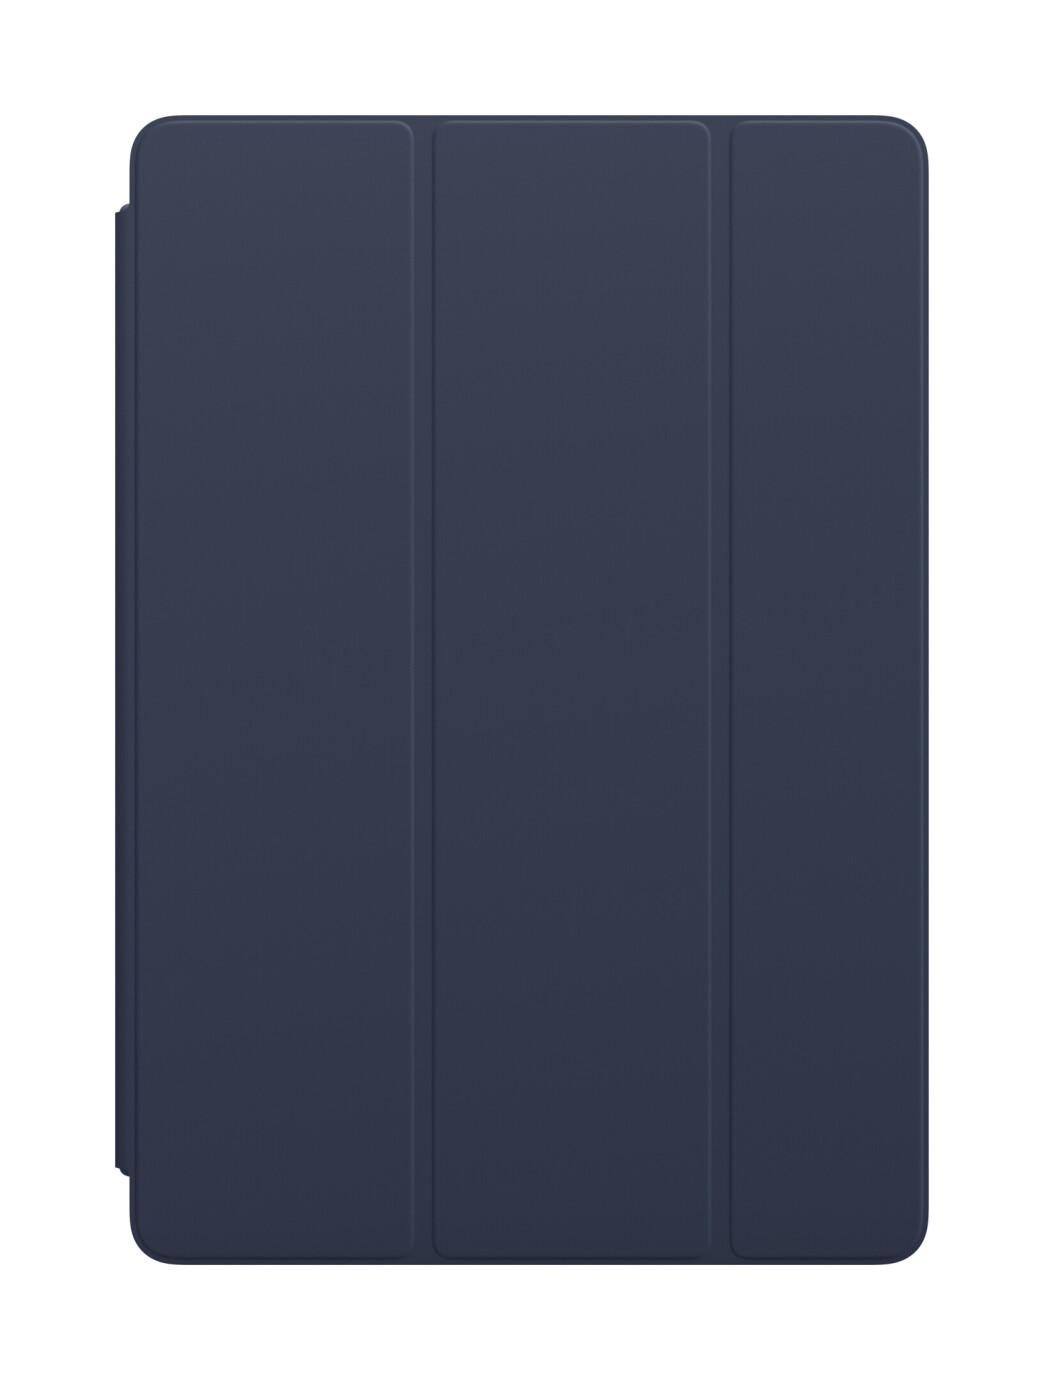 Apple Smart Cover für iPad 10,2